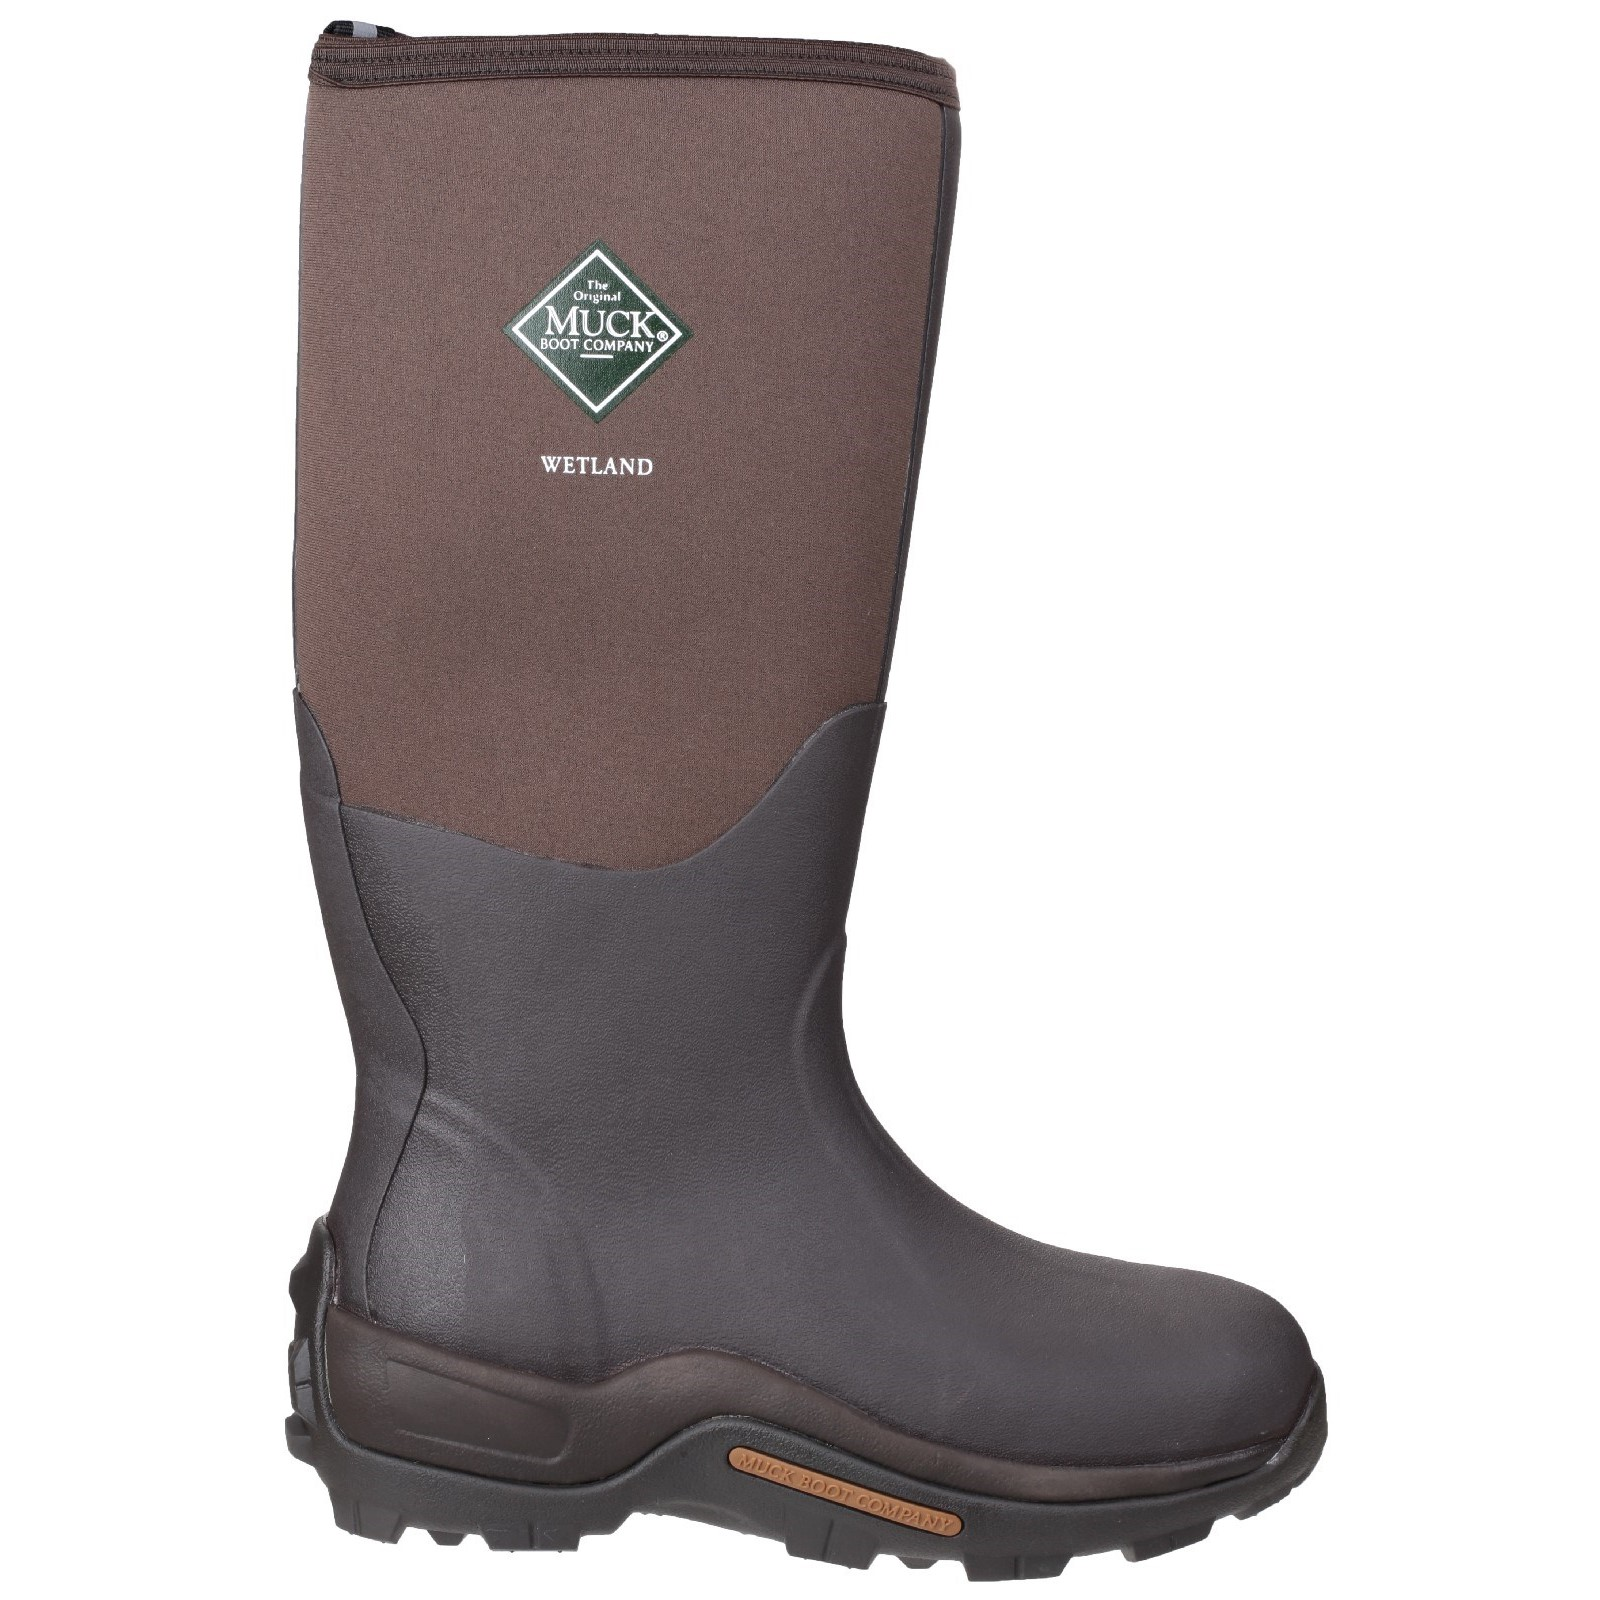 Muck Unisex Wetland Wellington Stiefel Gummistiefel Regenstiefel Slipper Schuhe